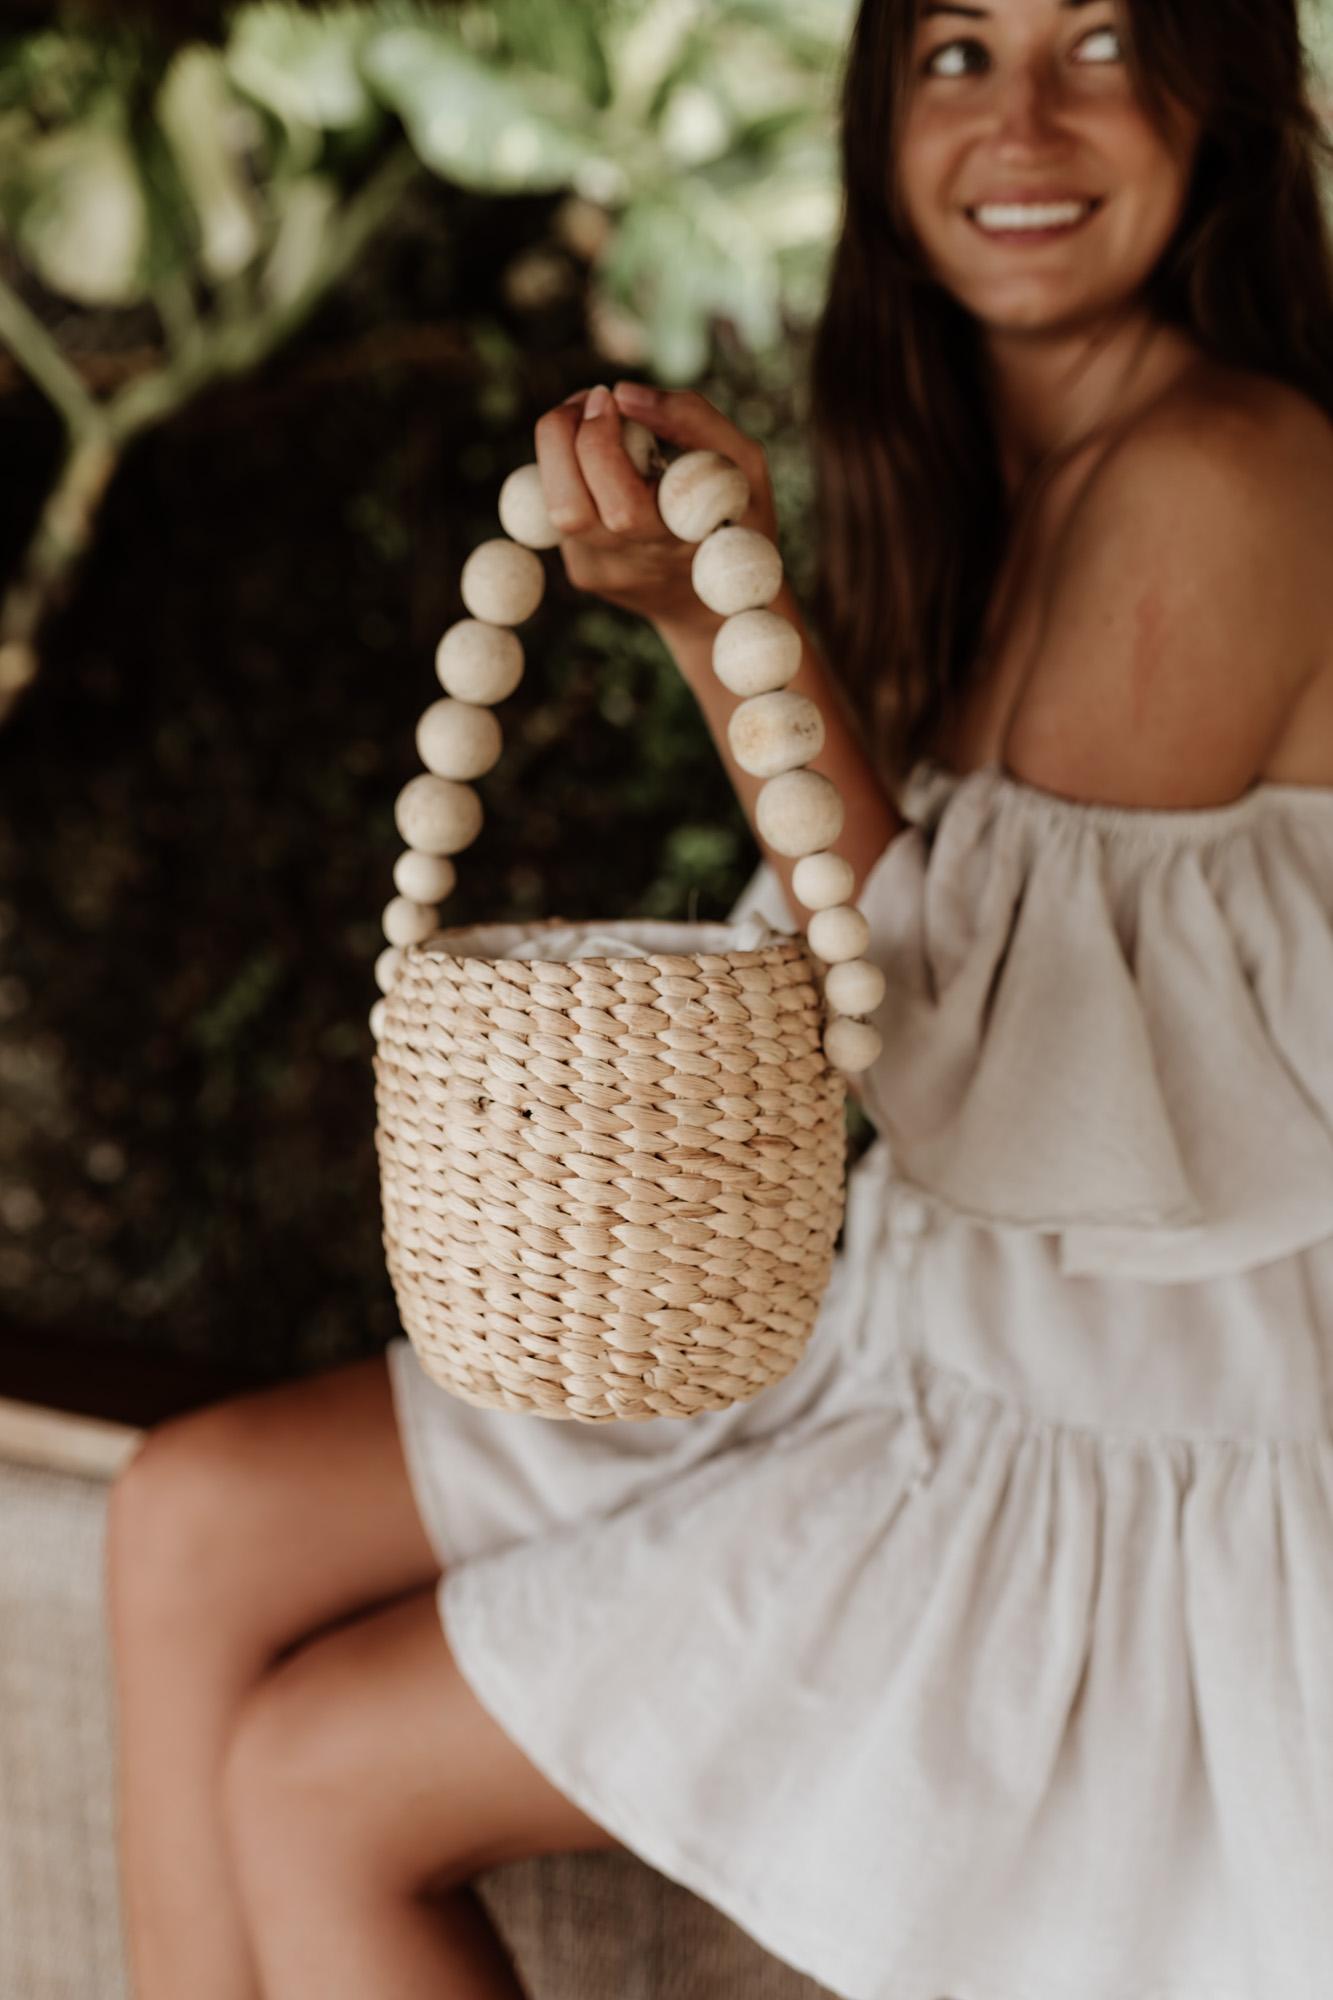 keira-mason-31-bits-sustainable-wooden-handle-bag.jpg